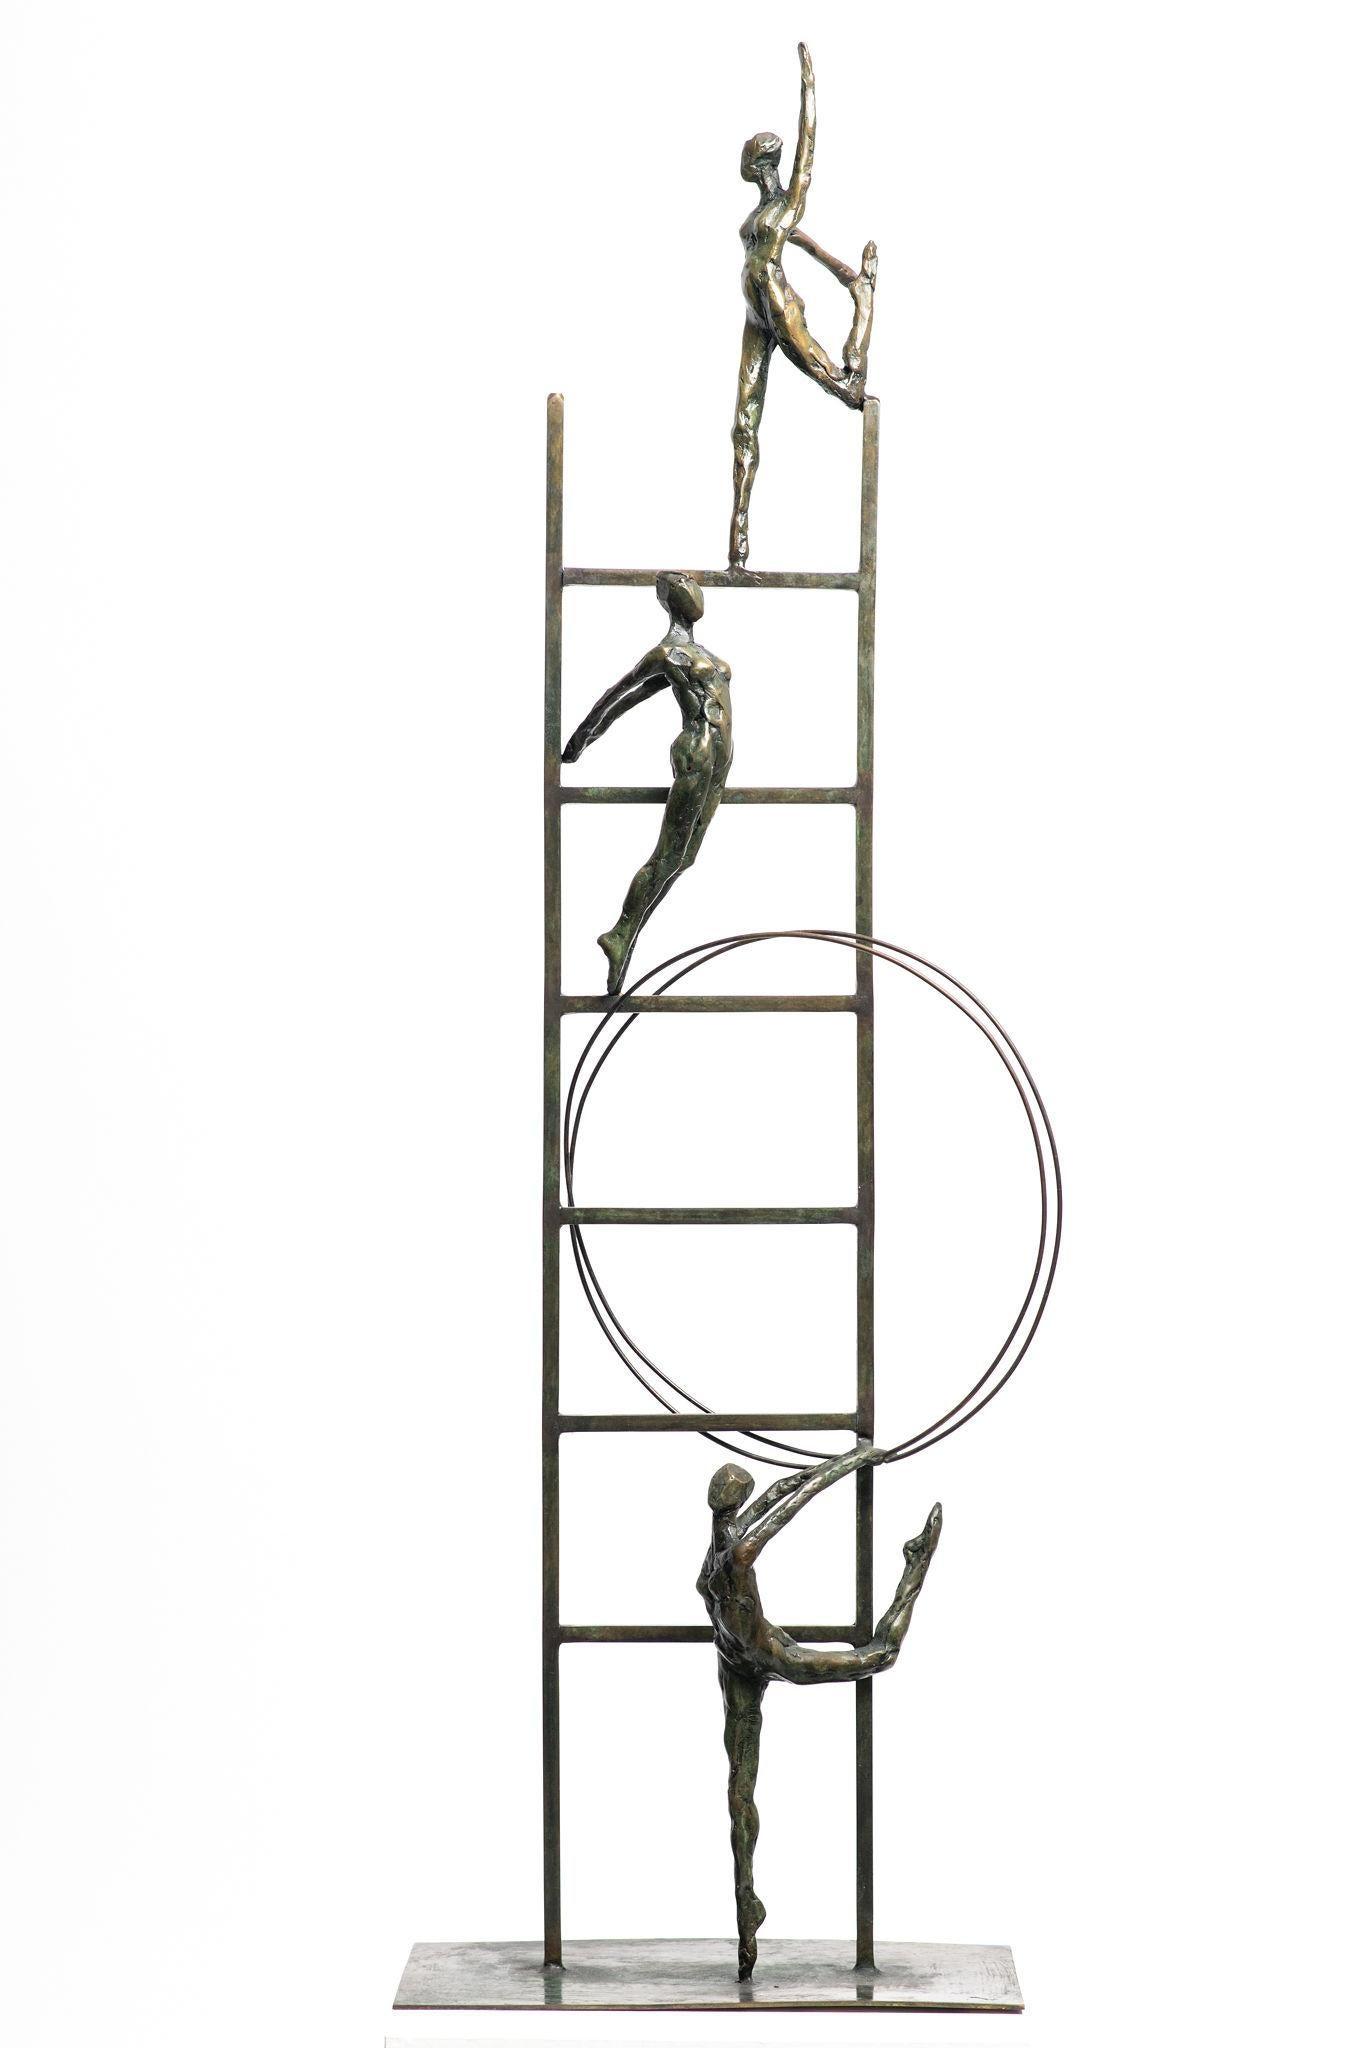 Liliane Danino, ladder for all, Elevation, Bronze Sculpture